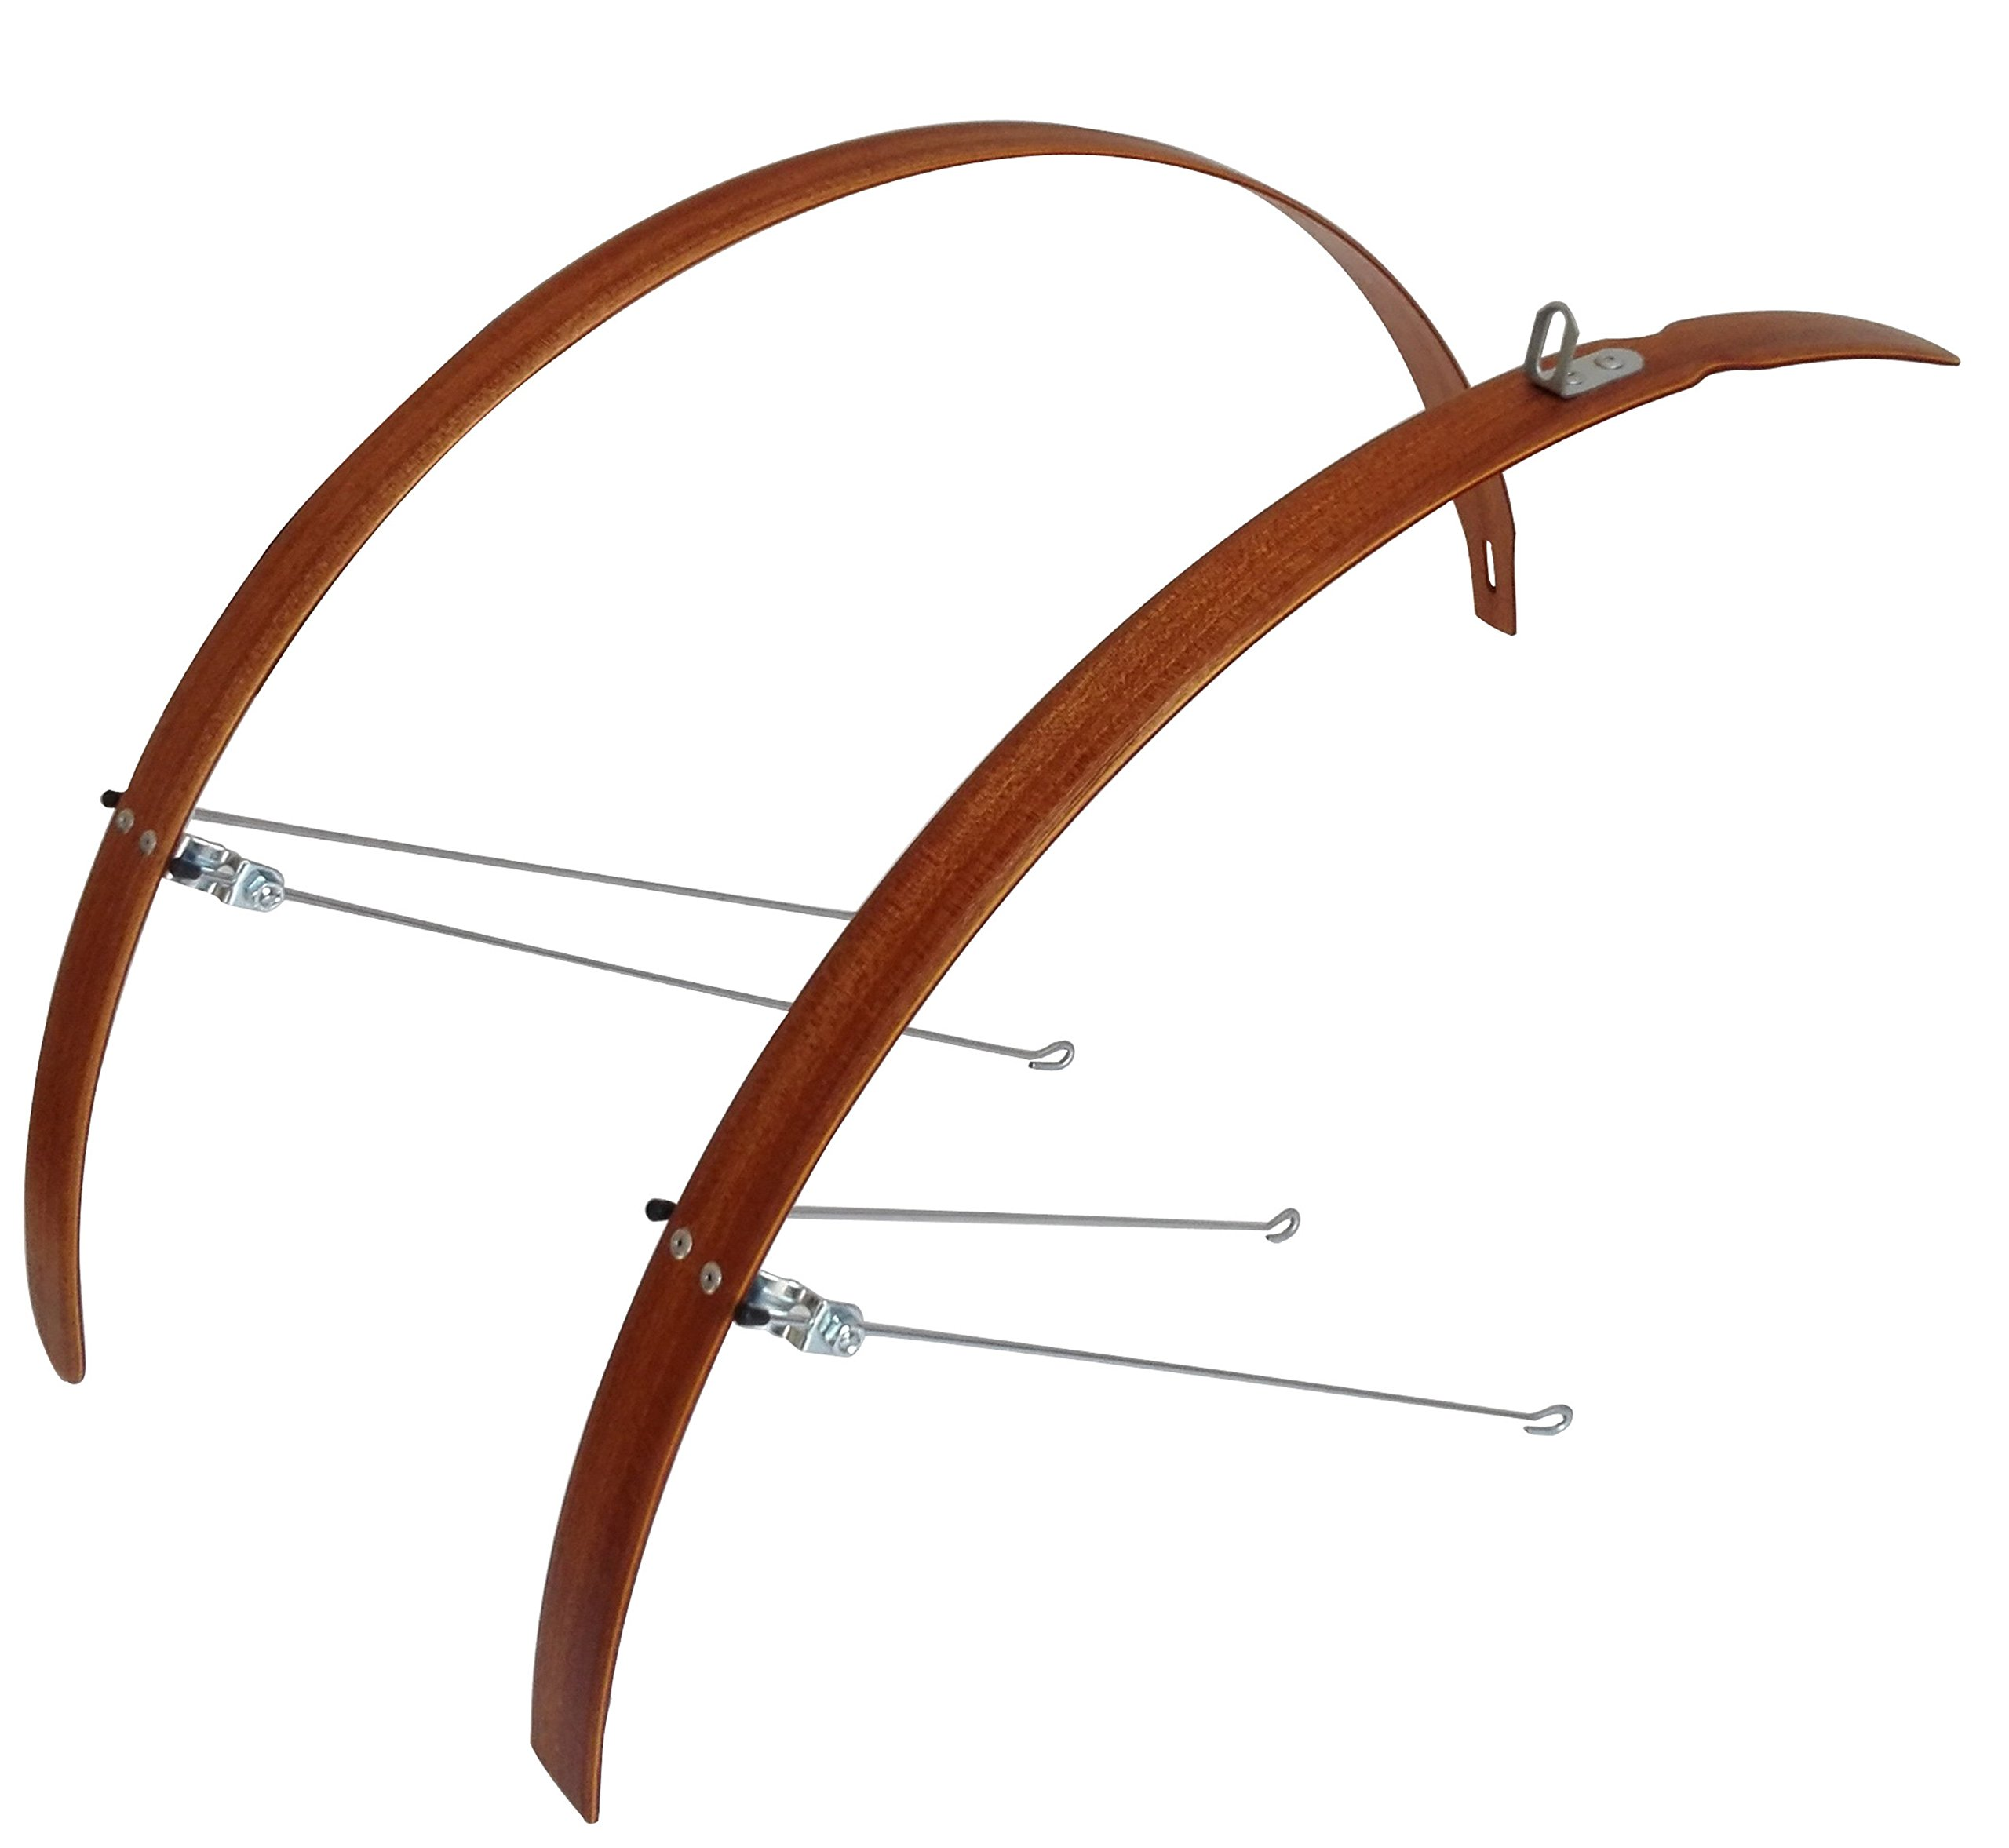 Urbinati bike Fender/Mudguard, Wooden Mudguard Set L35 Mahogany -- 26''/28''